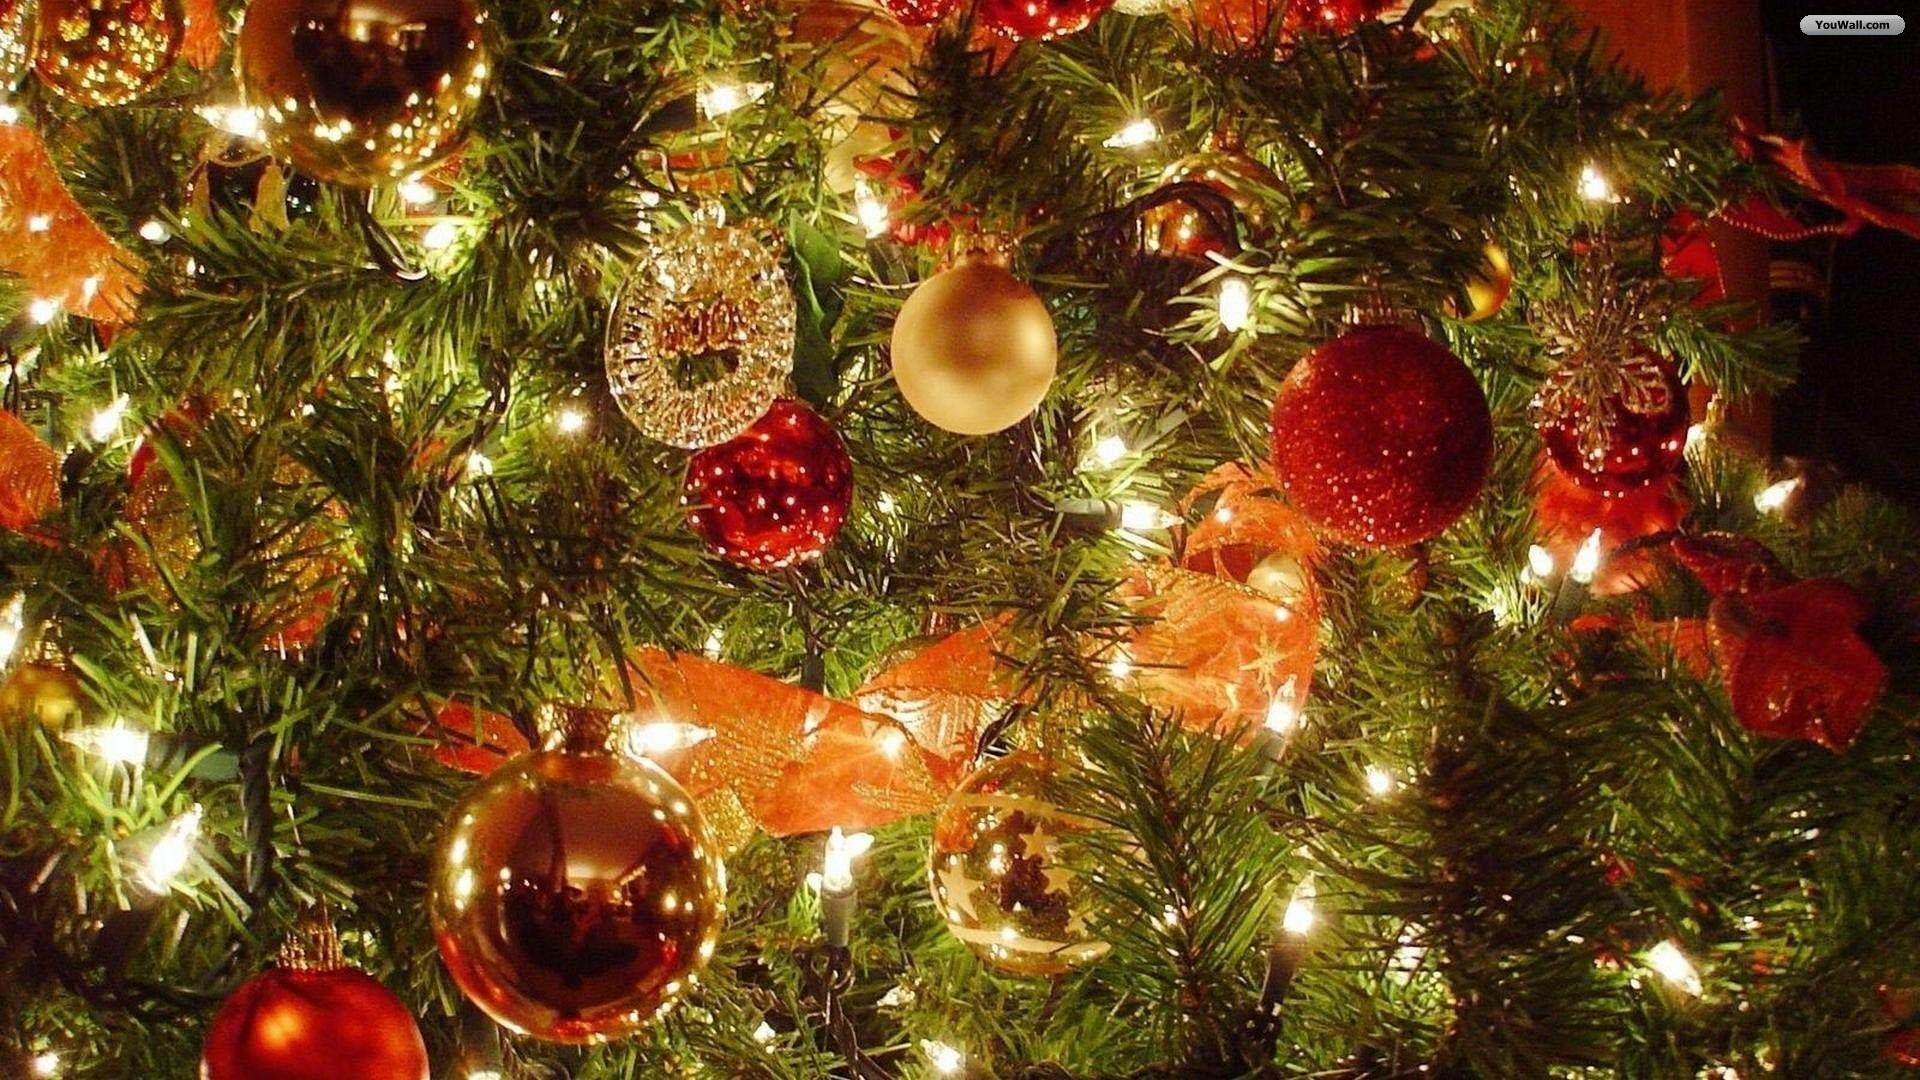 Desktop Christmas Wallpaper (63+ images)